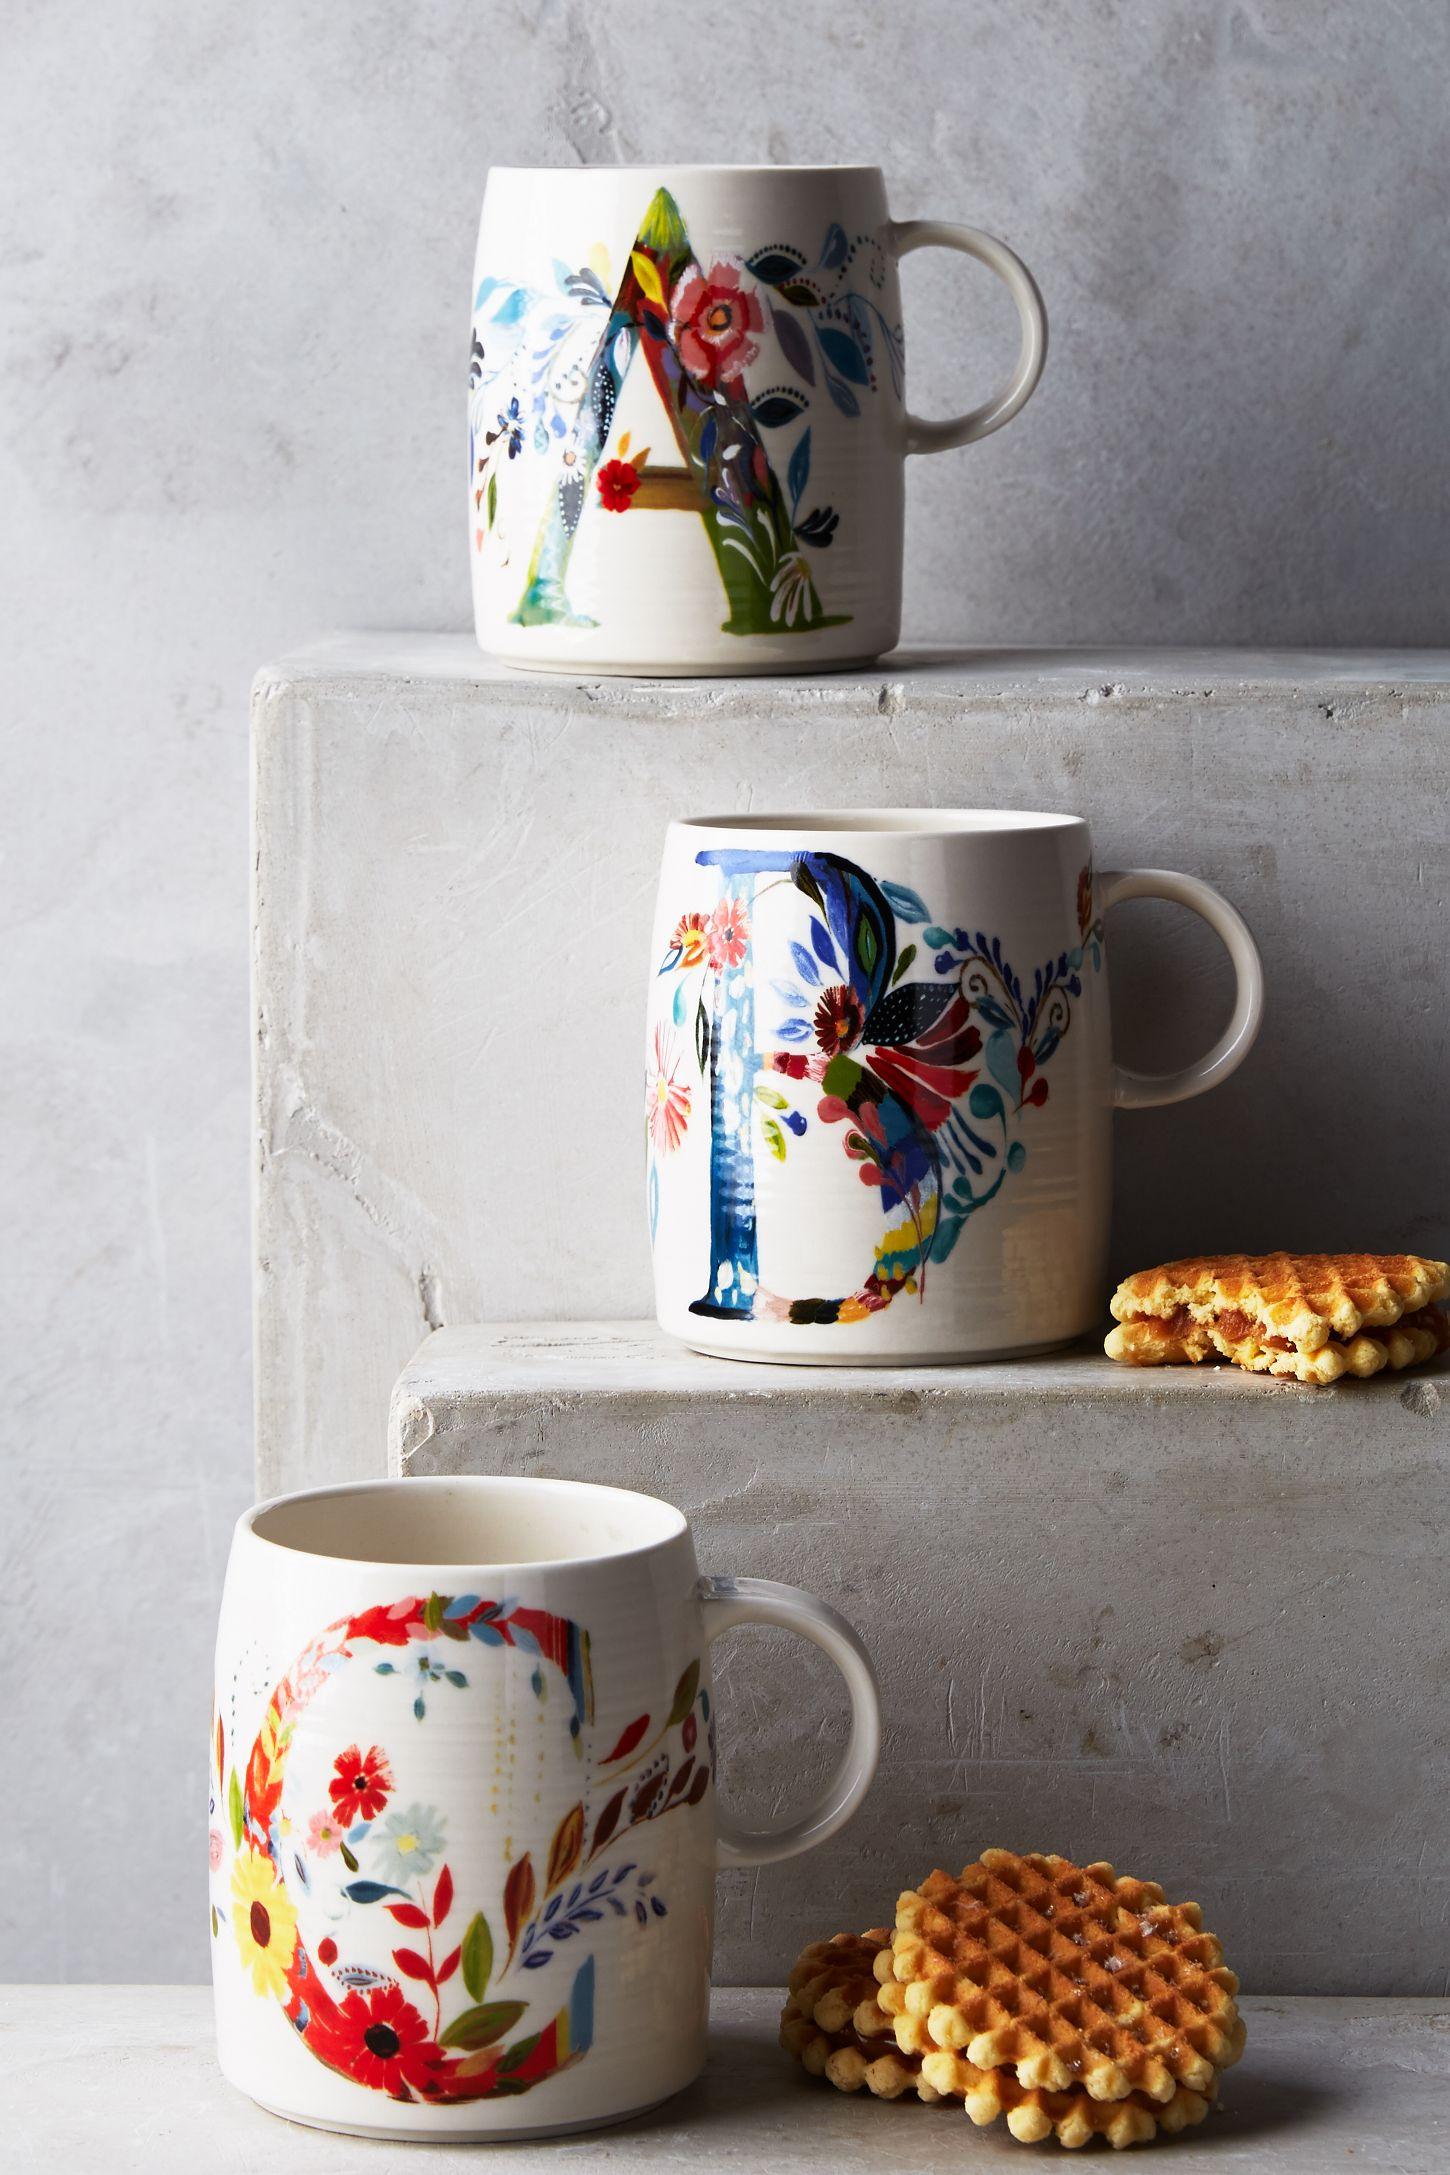 Mugs | Coffee Mugs & Teacups | Anthropologie